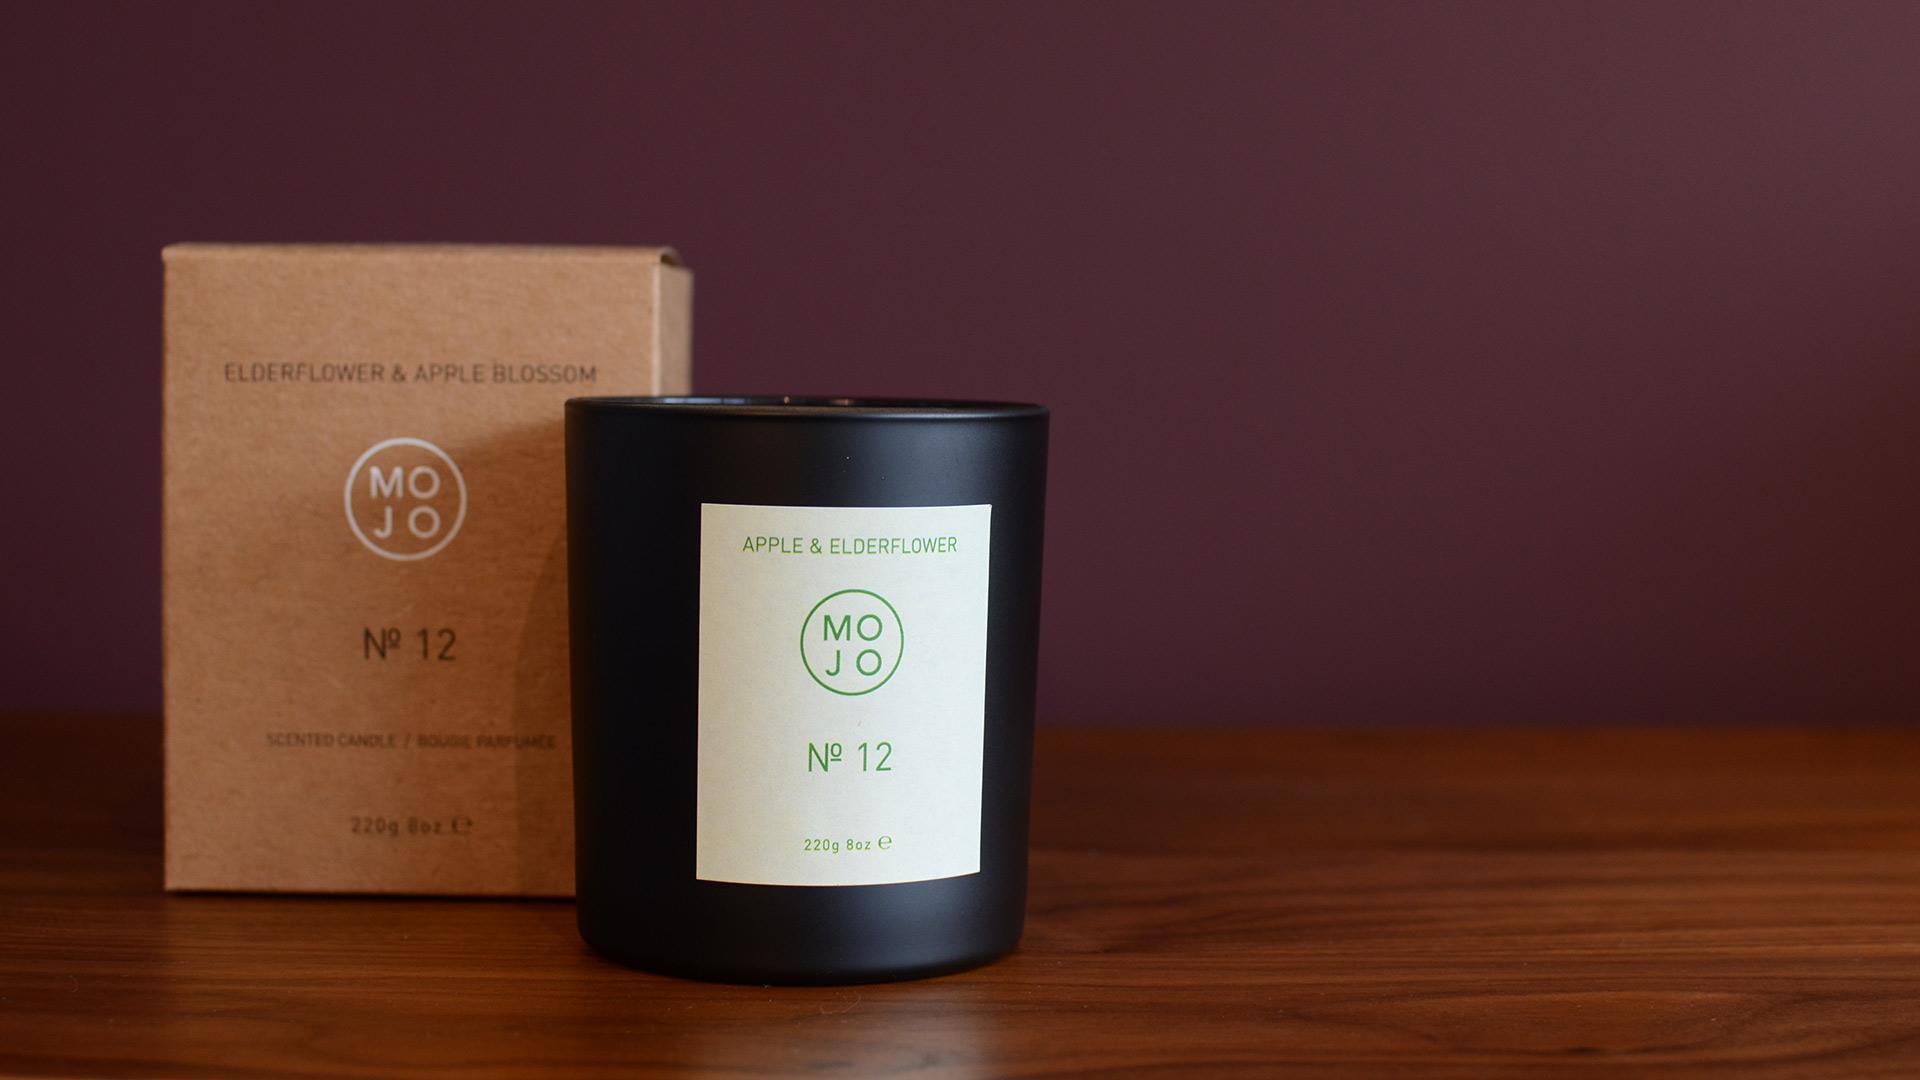 apple-&-elderflower-mojo-scented-candle